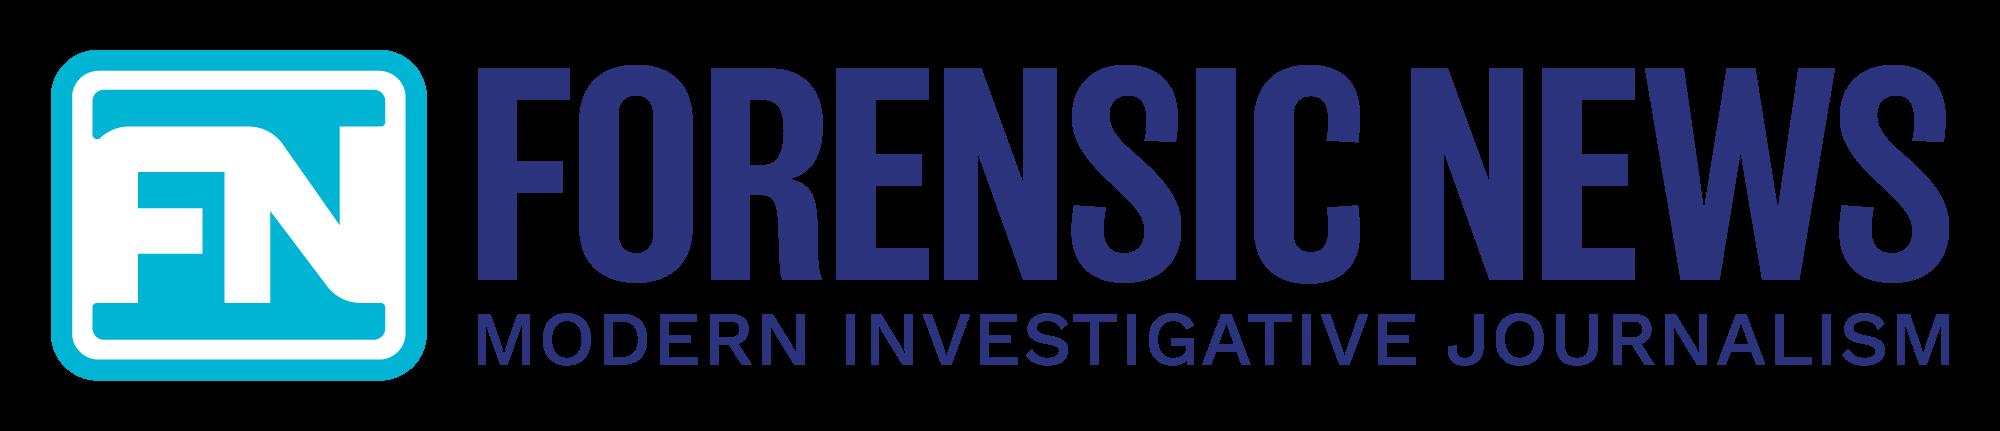 Forensic News